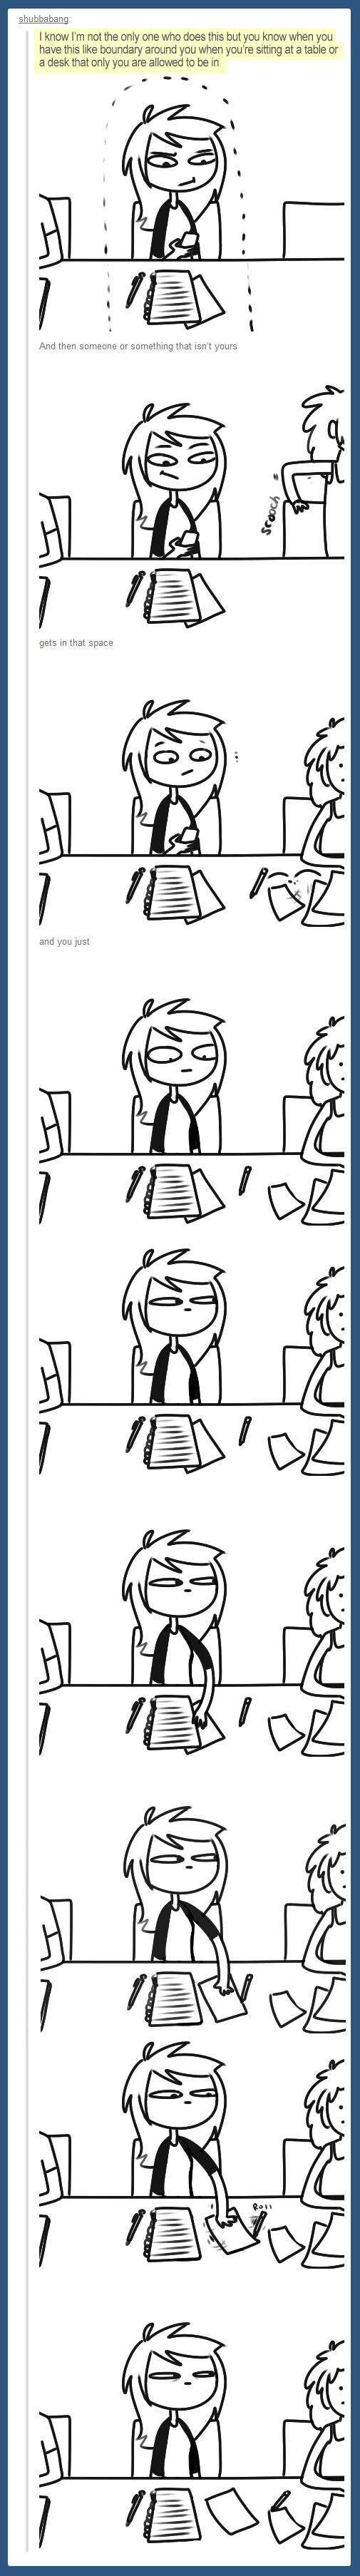 funny-girl-note-school-comic